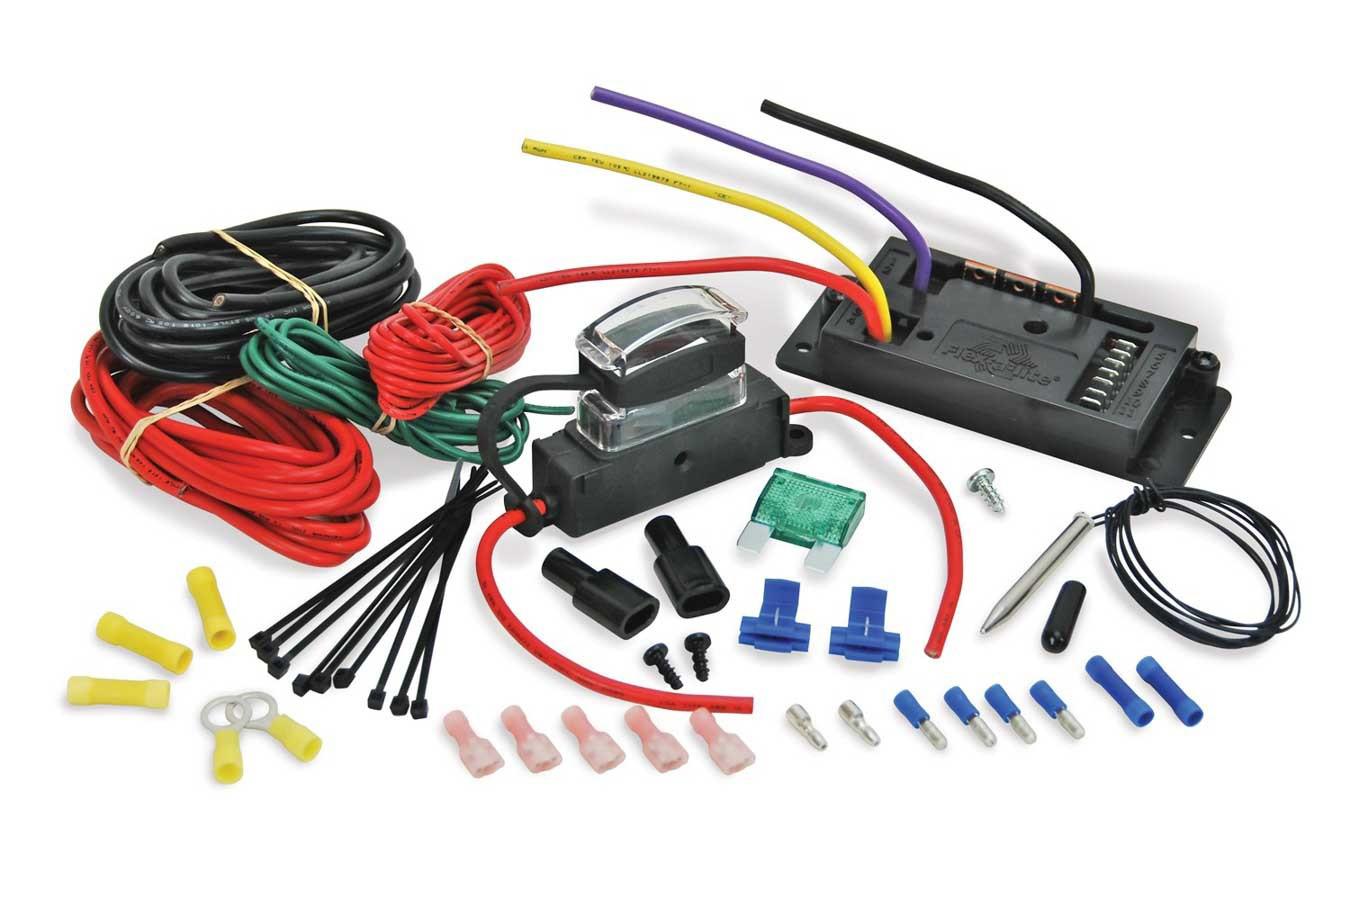 Flex-A-Lite 106999 Fan Controller, Quick Start, Adjustable, 160-220 Degree F Activation Range, Push-In Temperature Sensor, Harness, Kit